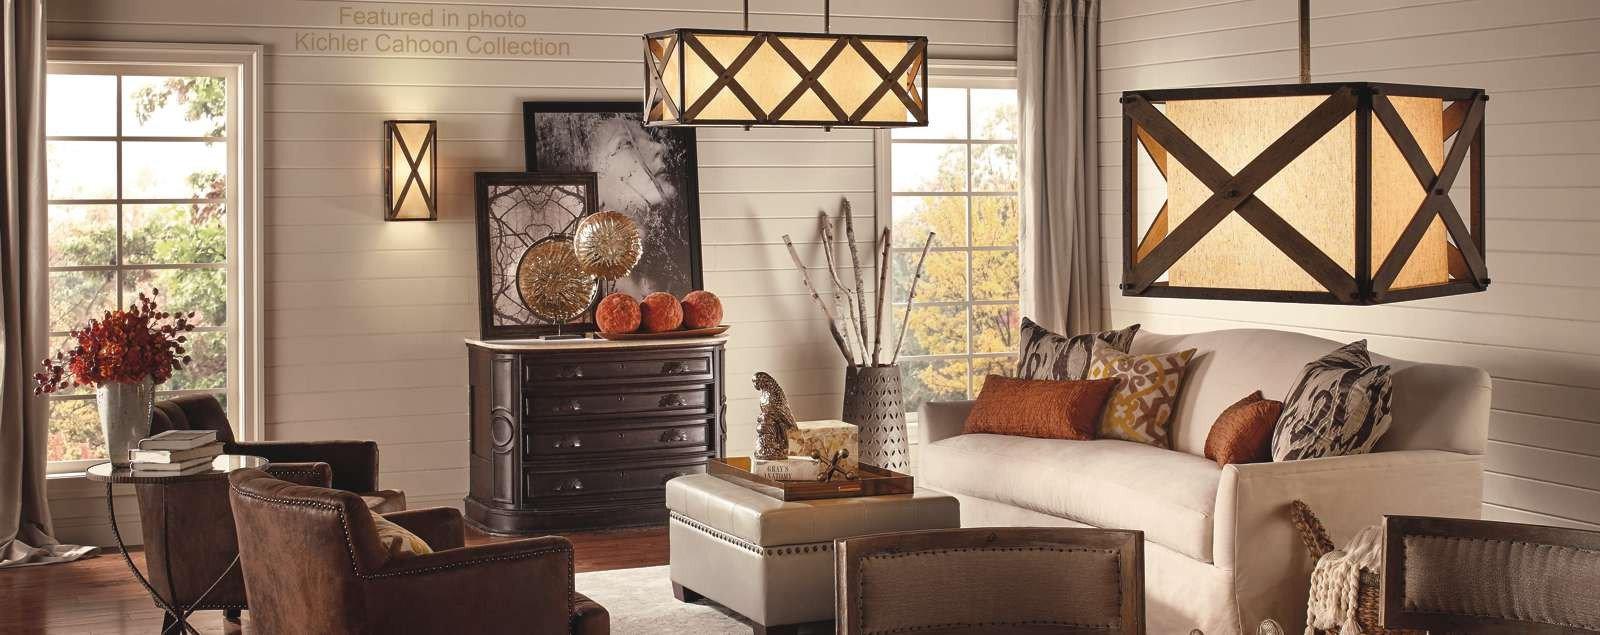 Plug In Wall Light for Bedroom Fresh Home Lighting Light Fixtures From Hansen wholesale